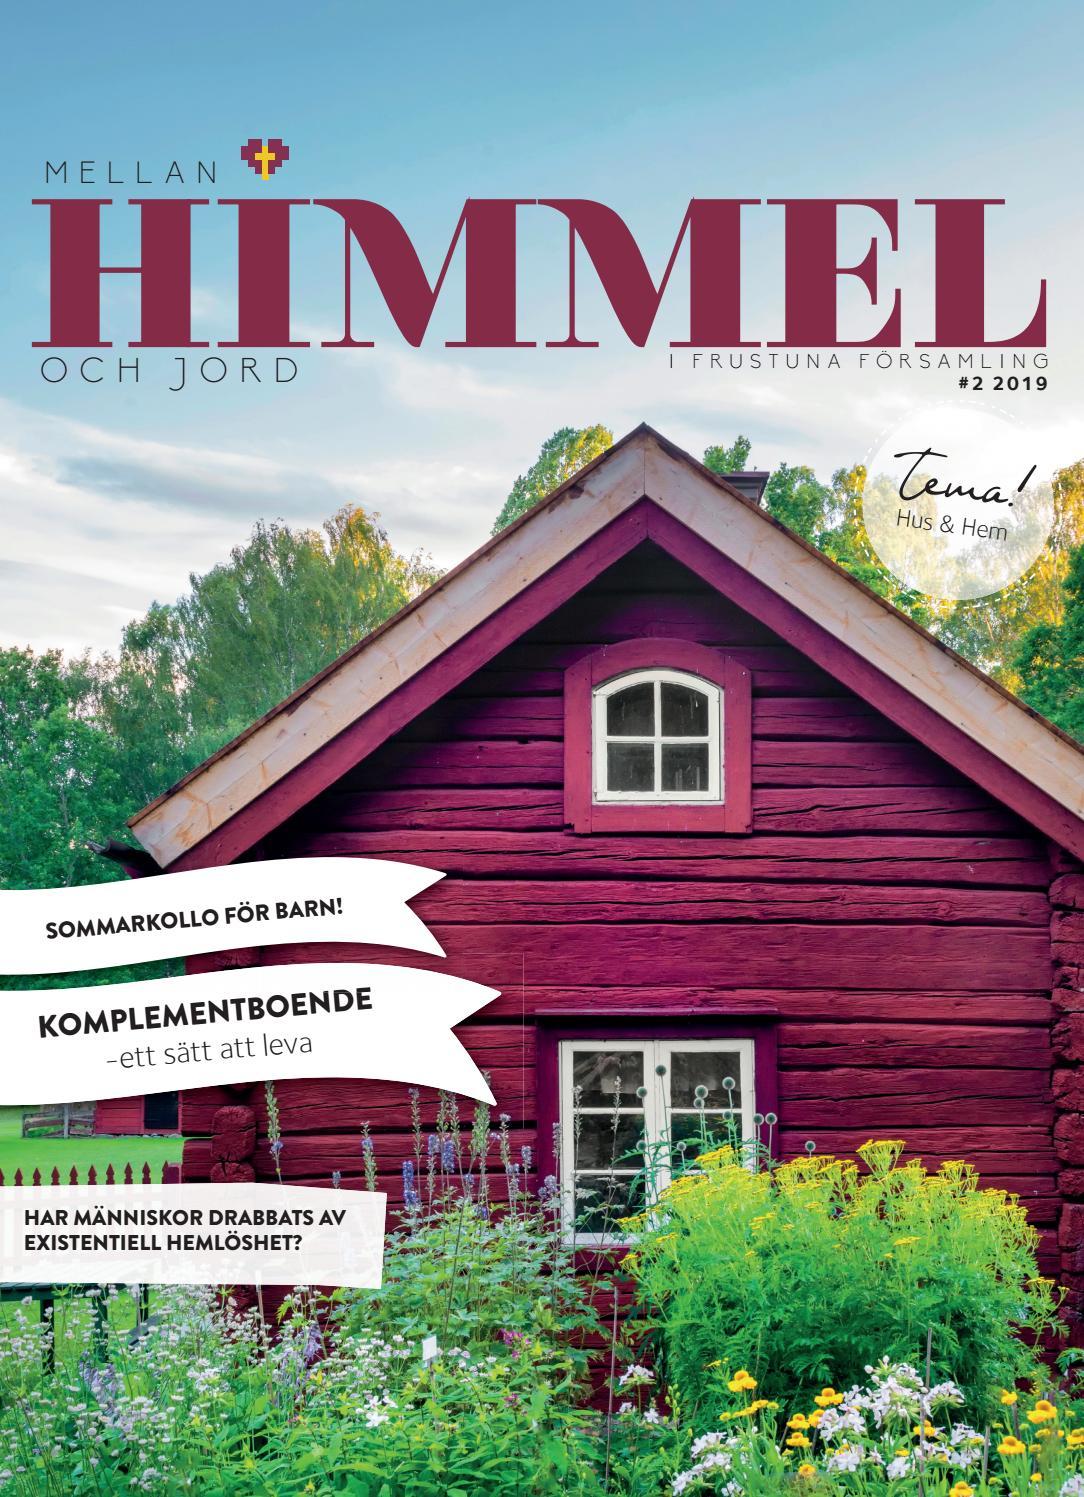 Mellan Himmel & Jord #2 2018 by Frustuna frsamling - issuu